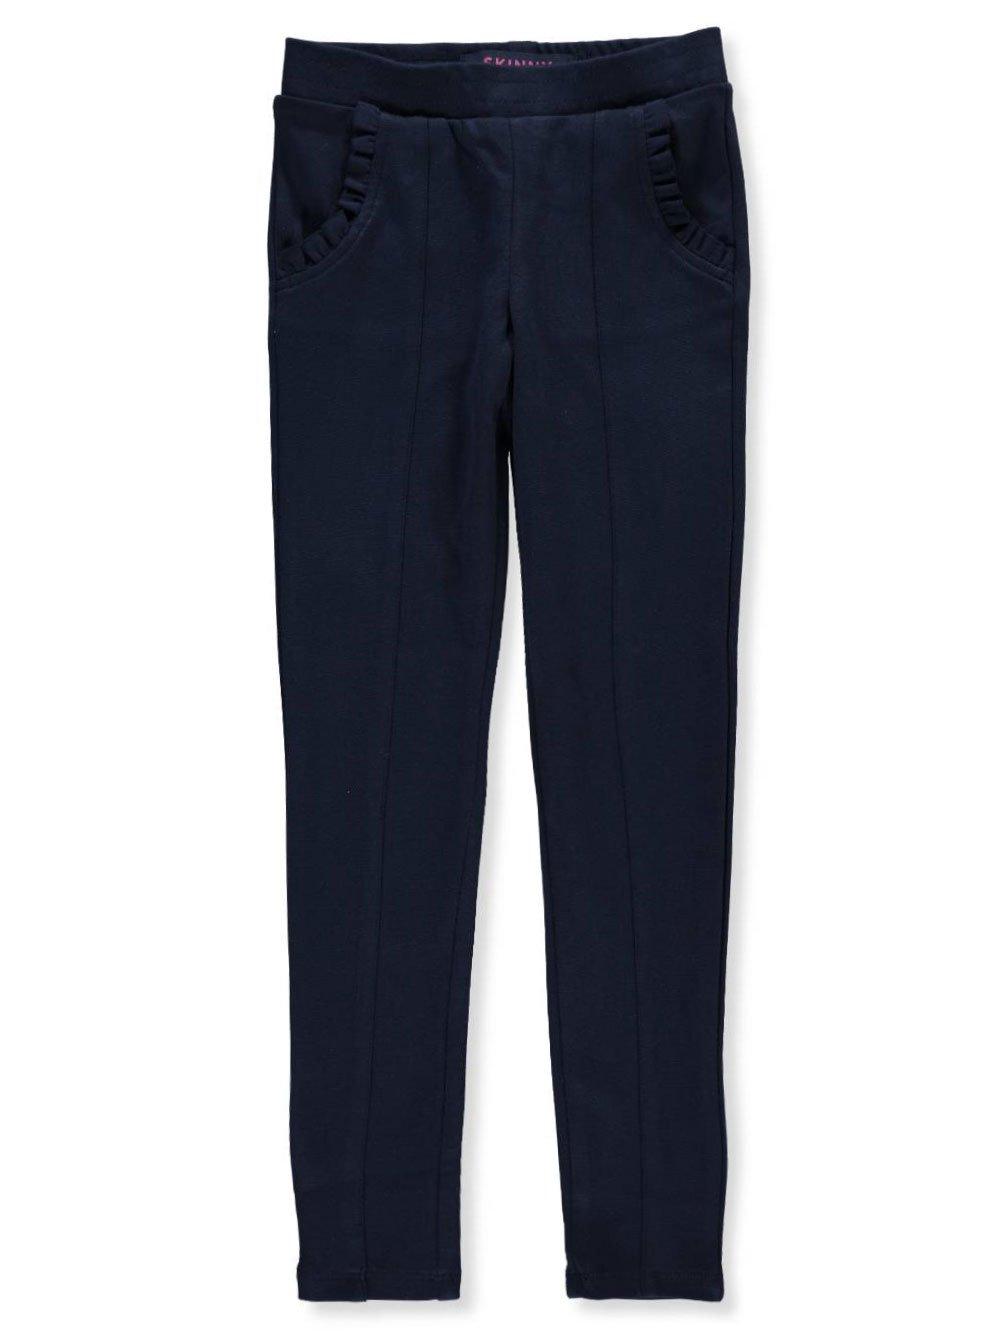 French Toast School Uniform Girls Ruffle Knit Pull-on Pants, Navy, Large (10/12)